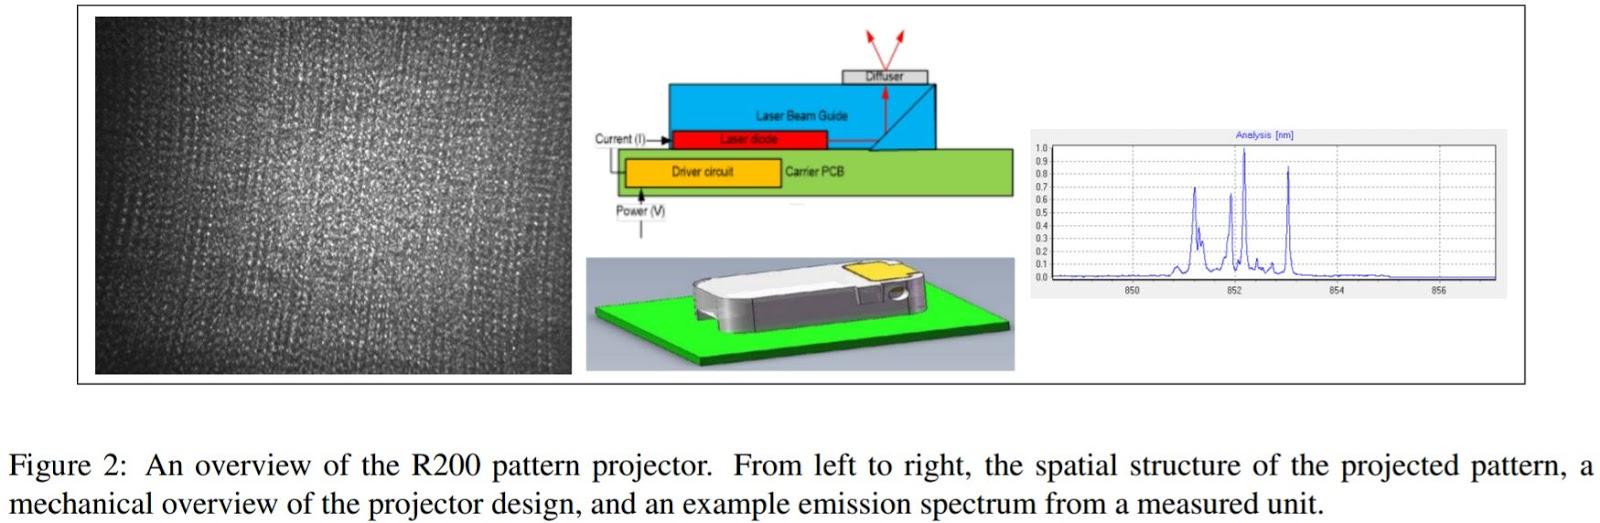 Image Sensors World: Intel Stereo Realsense Camera Review